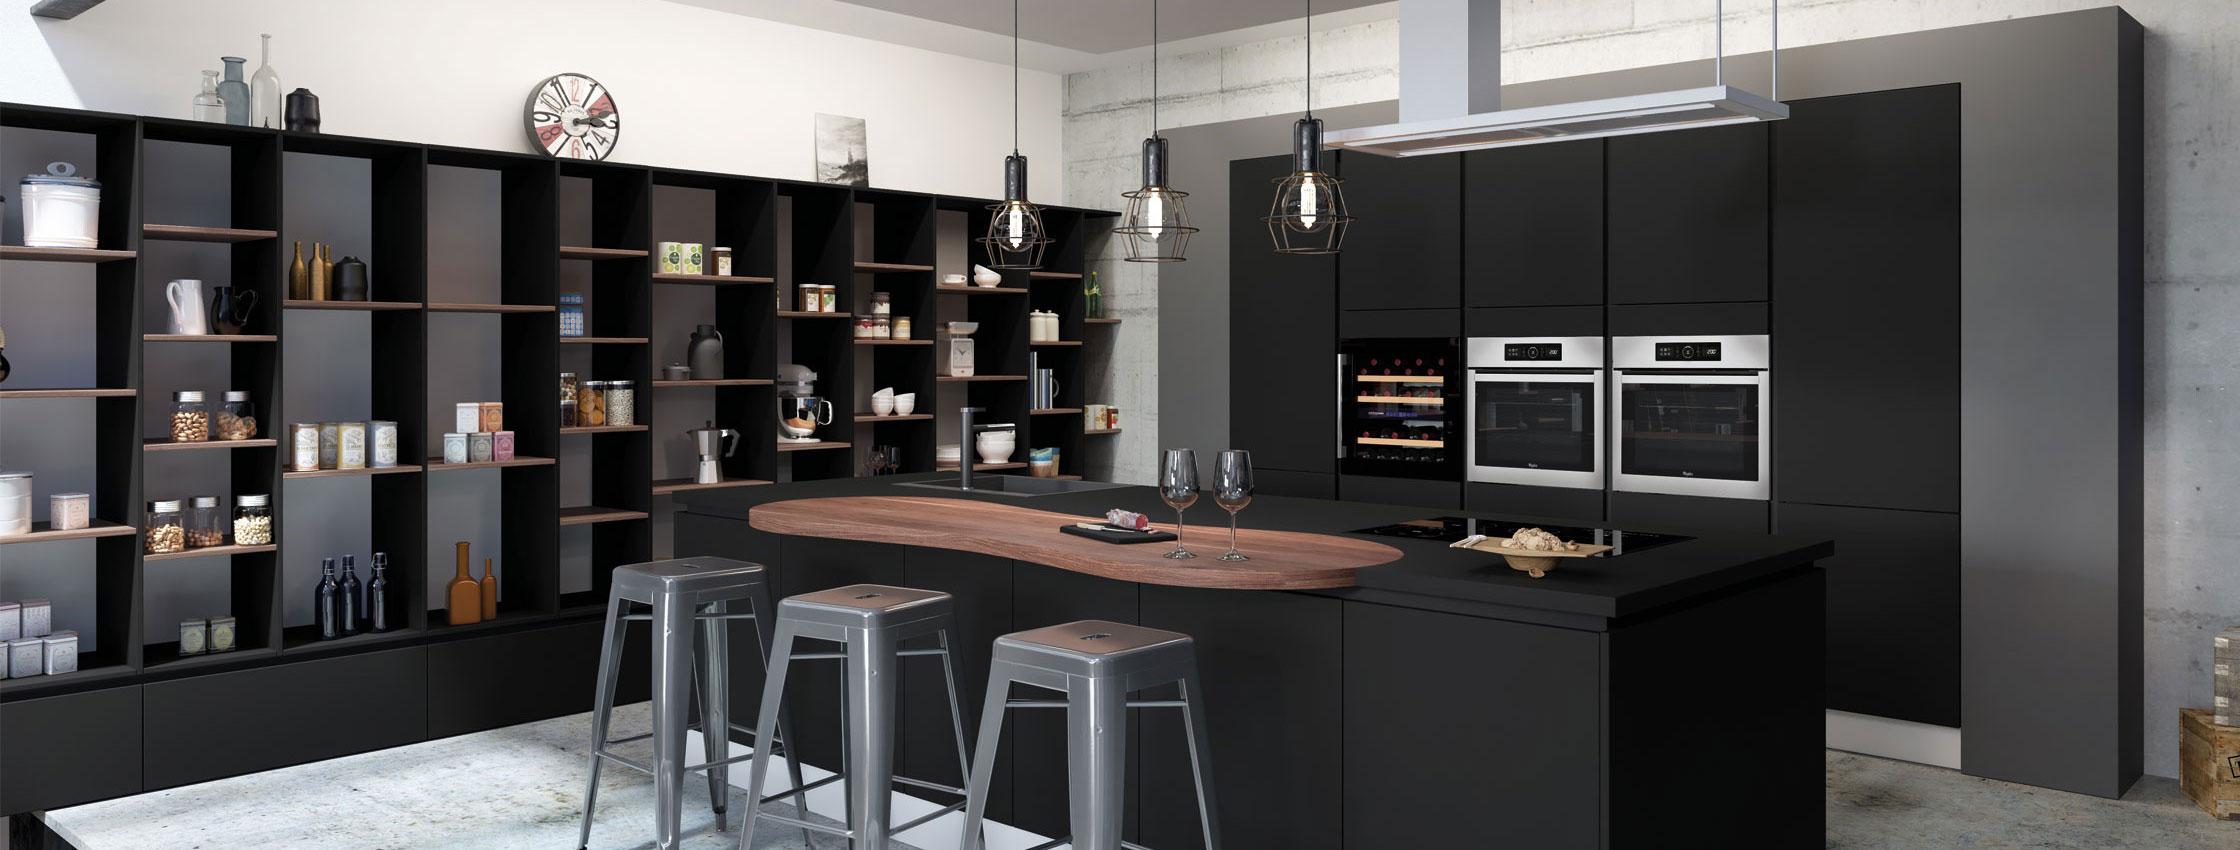 les cuisines en strastifi comera cuisines. Black Bedroom Furniture Sets. Home Design Ideas